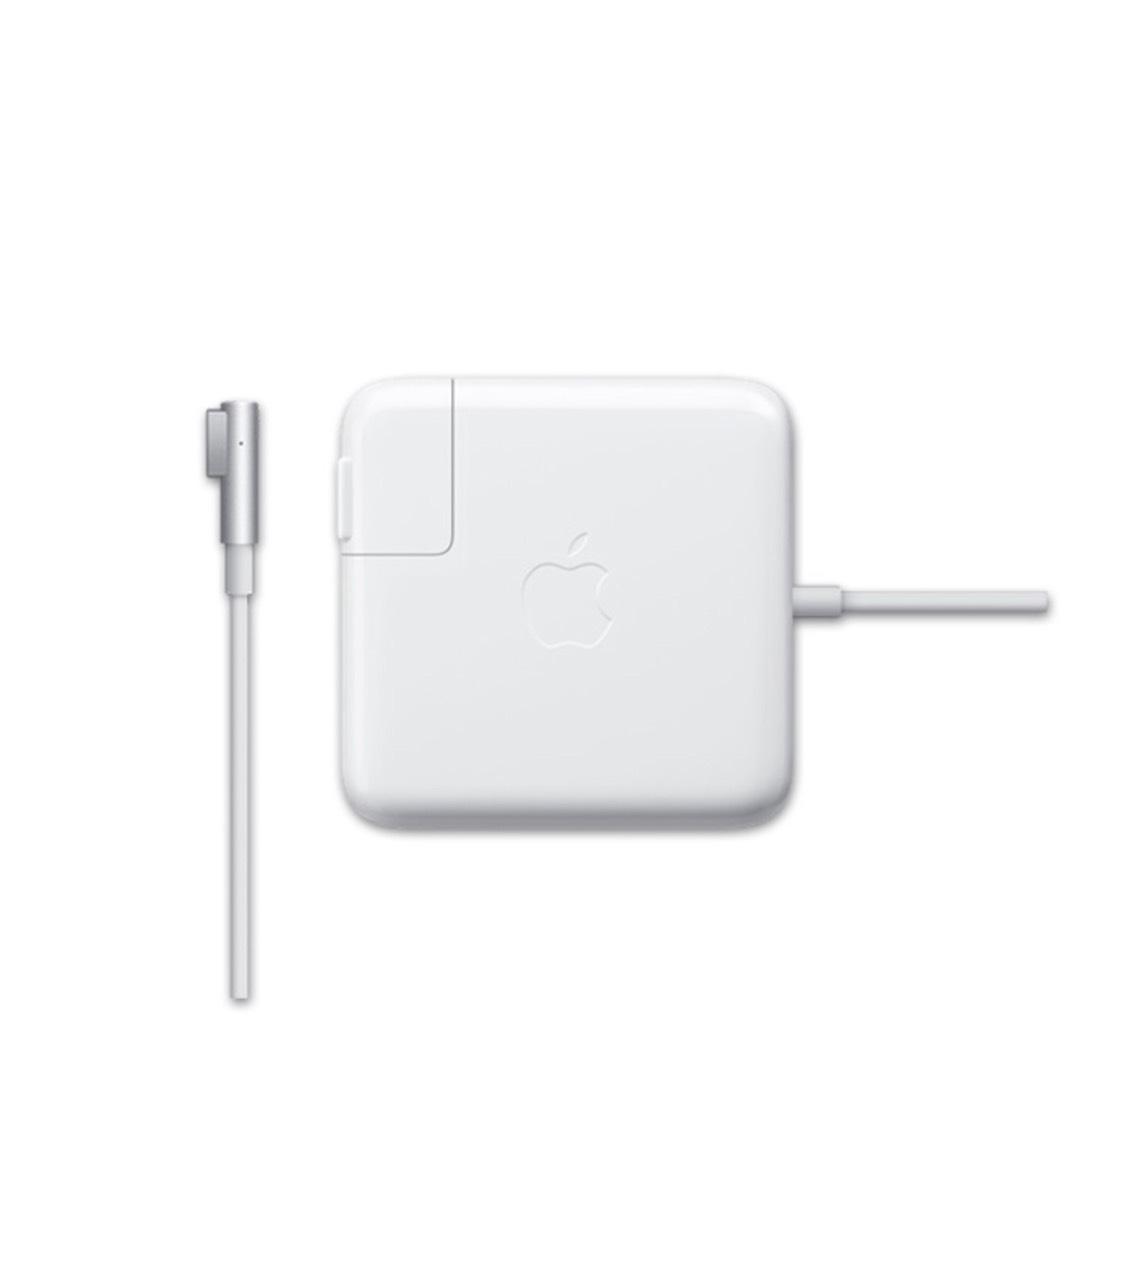 Apple 60W magsafe 2 Power Adapter (Chính hãng)